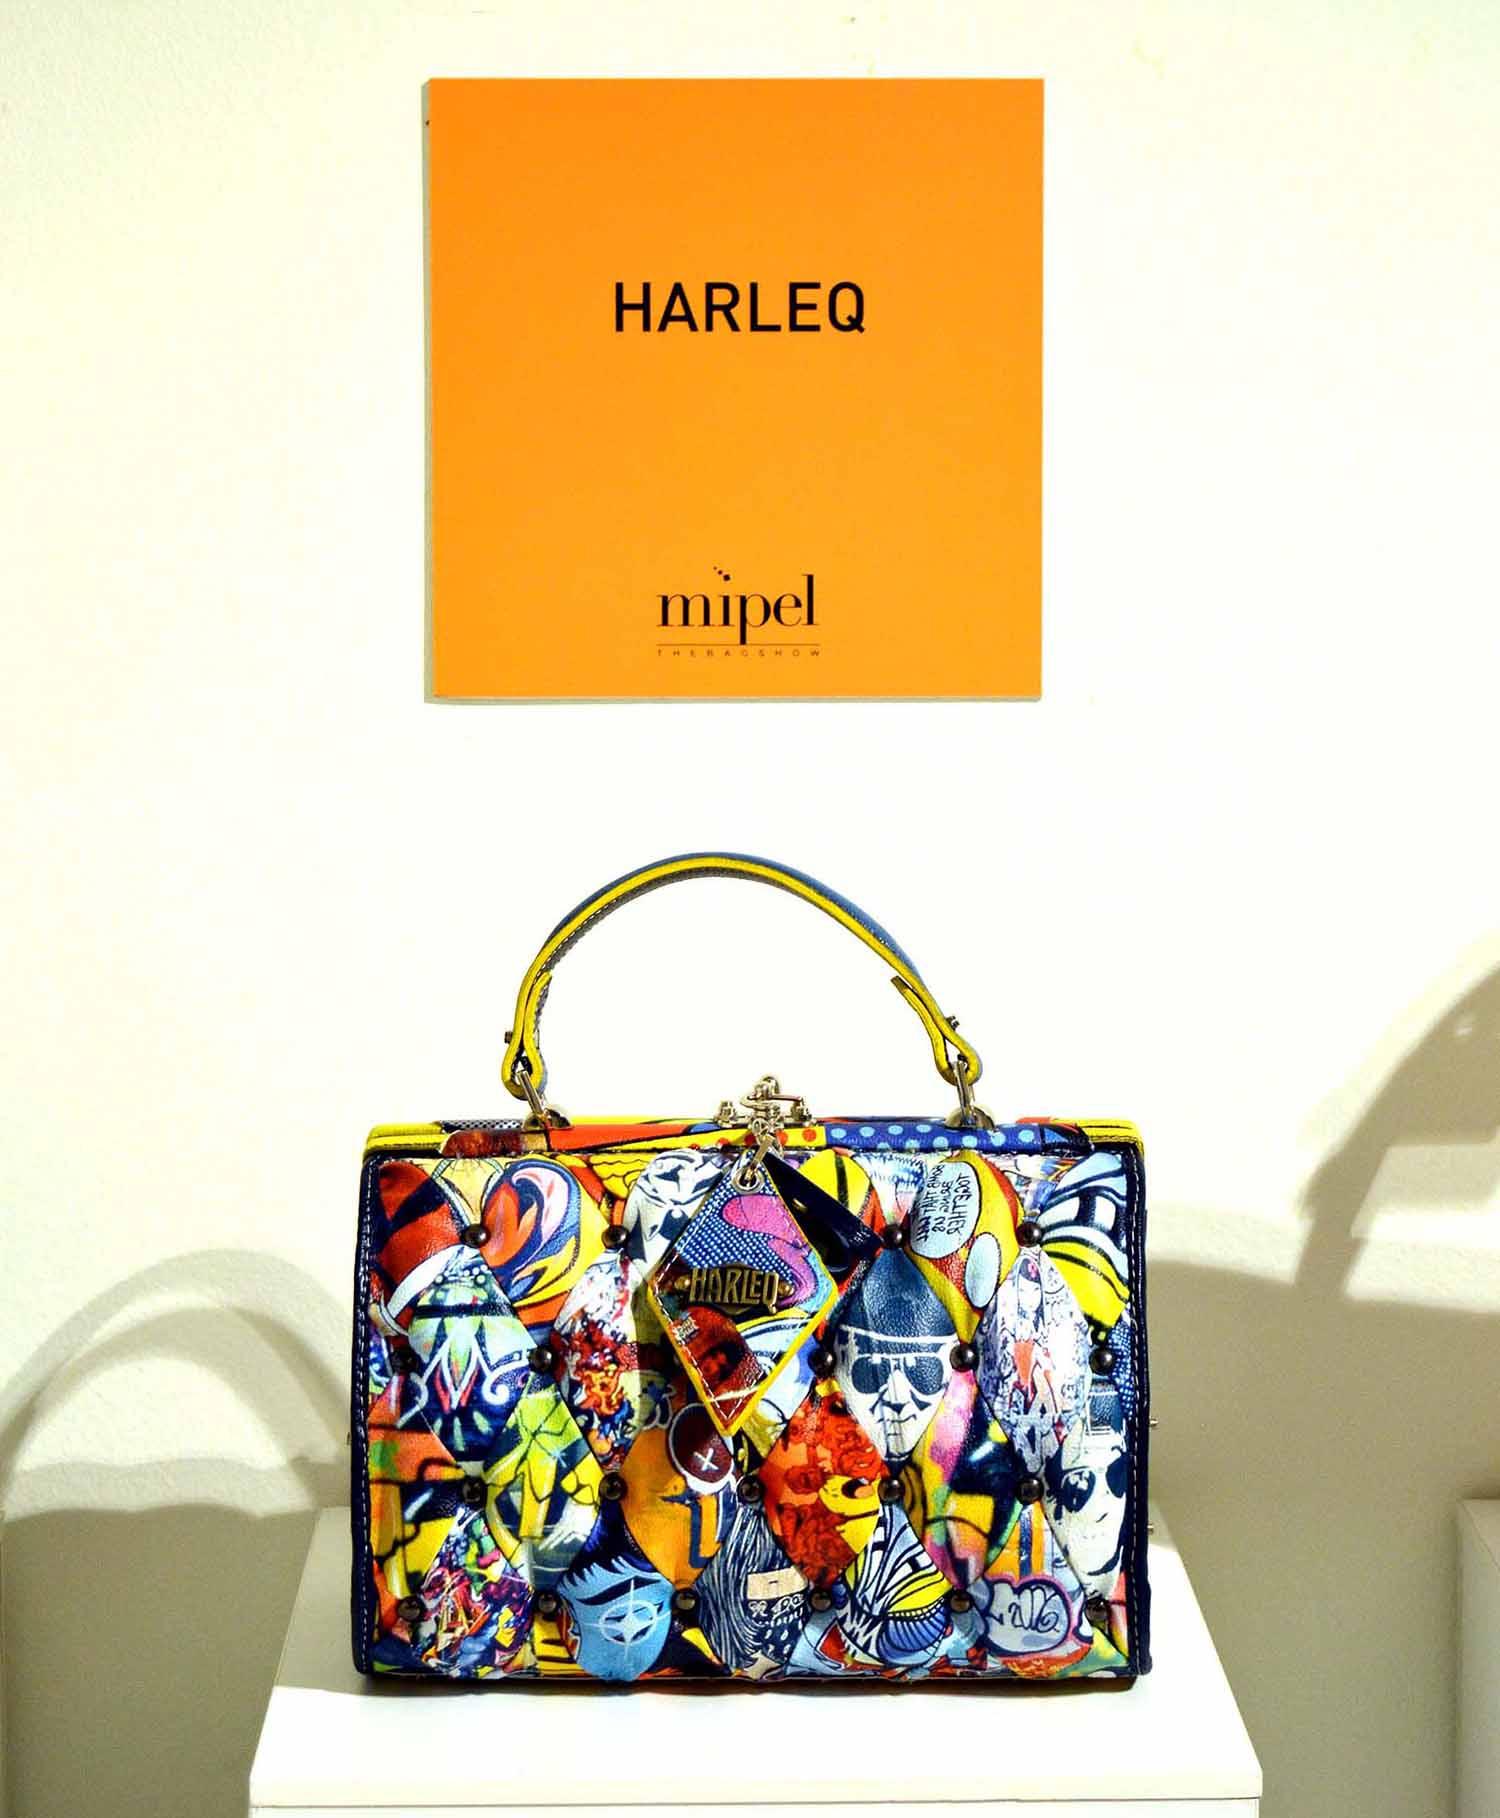 harleq-pop-bag-winner-mipel-andy-warhol